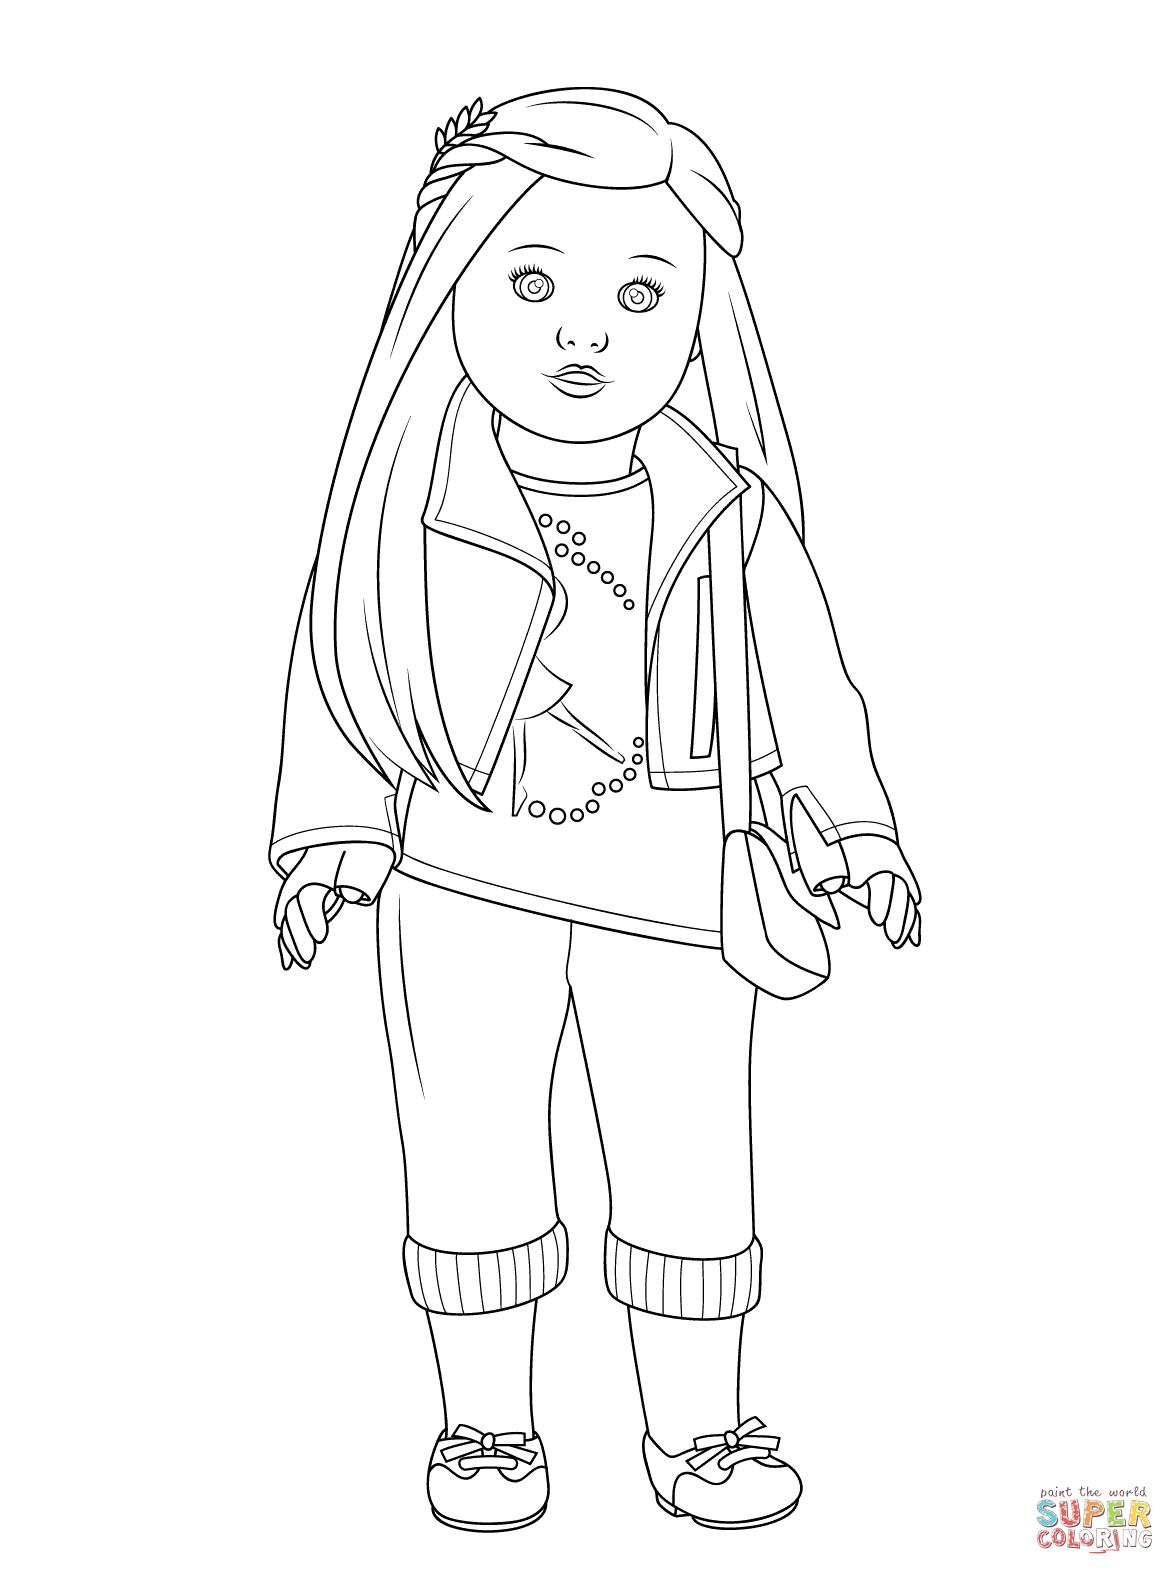 dolls coloring pages lol dolls coloring pages best coloring pages for kids dolls coloring pages 1 1